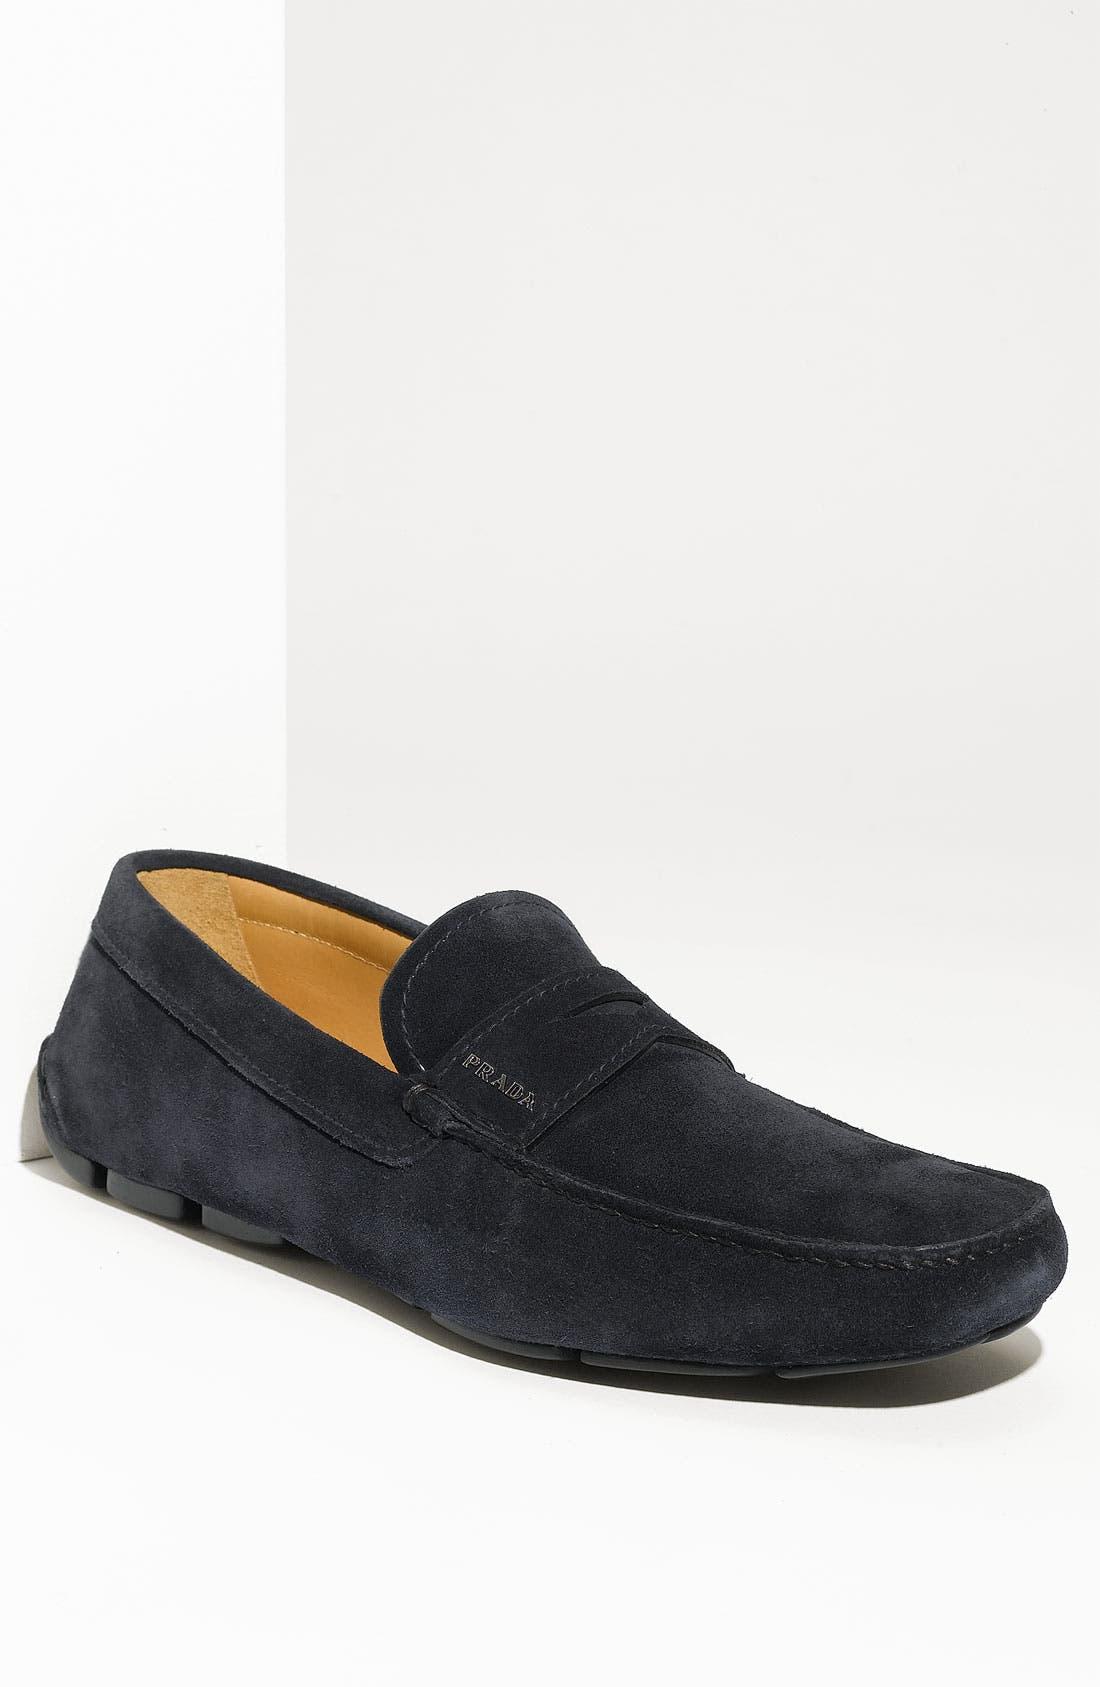 Alternate Image 1 Selected - Prada Suede Penny Driving Shoe (Men)